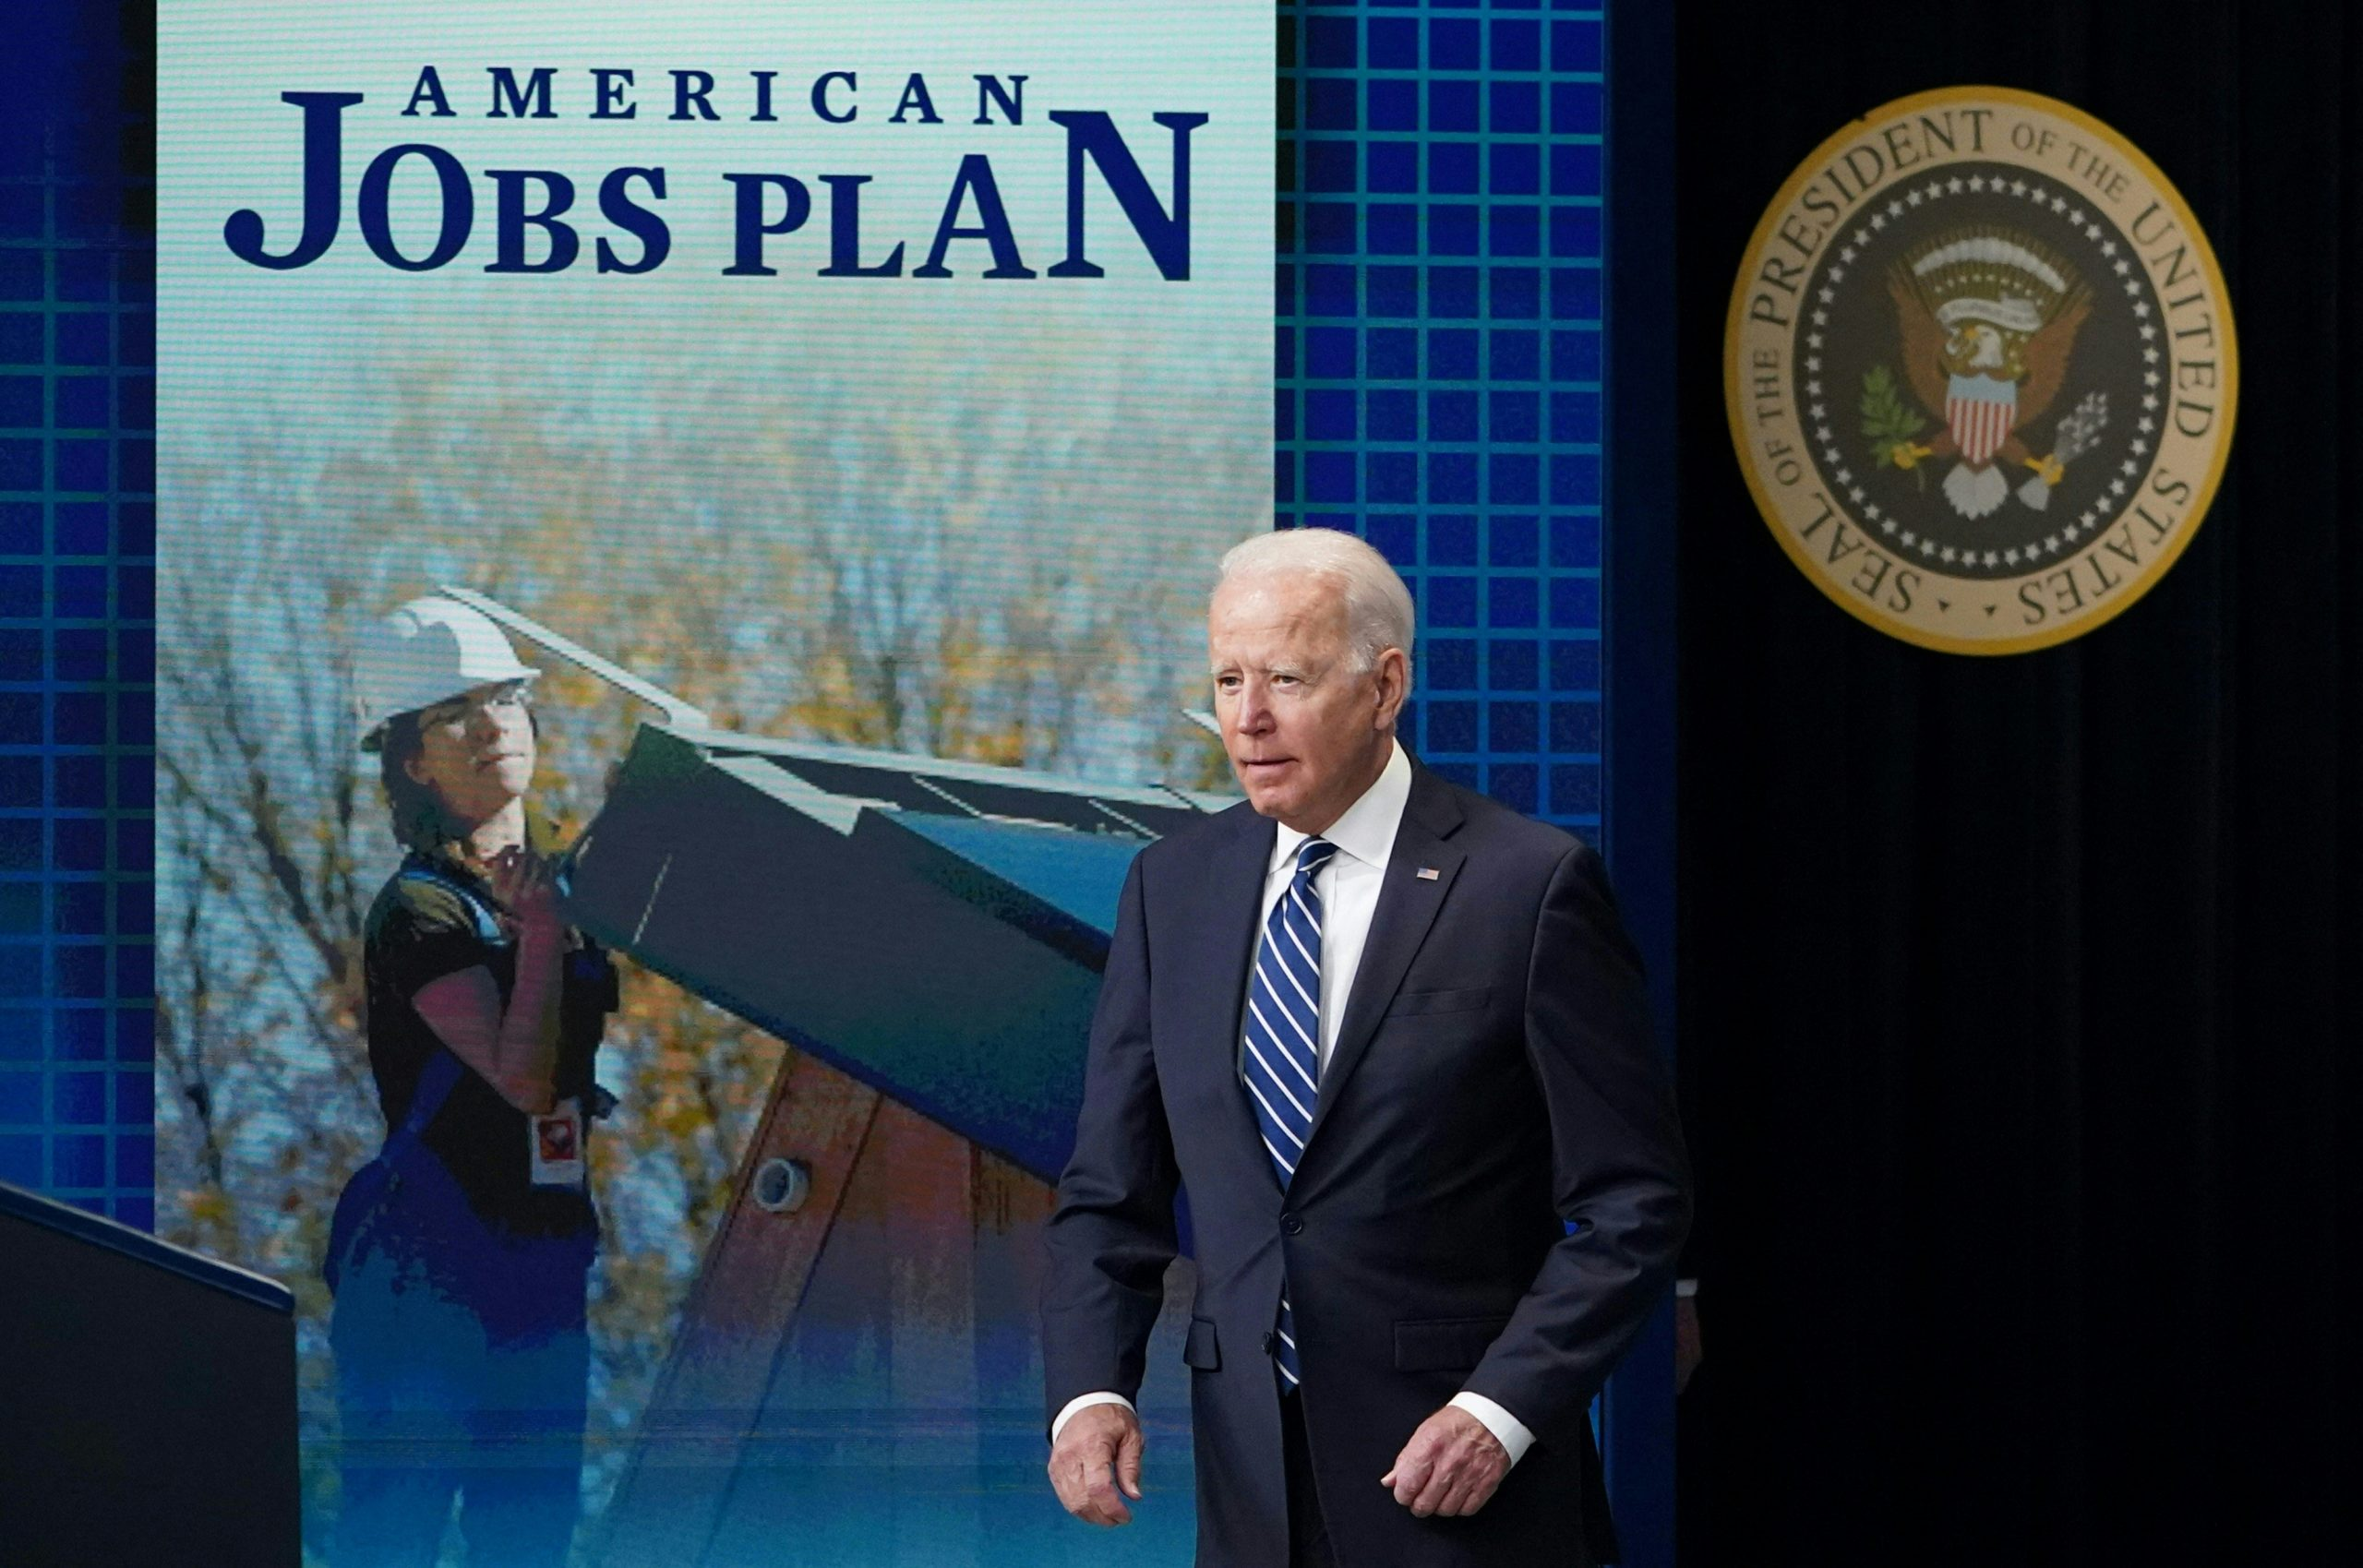 President Joe Biden arrives to speak about the June jobs report on July 2. (Mandel Ngan/AFP via Getty Images)